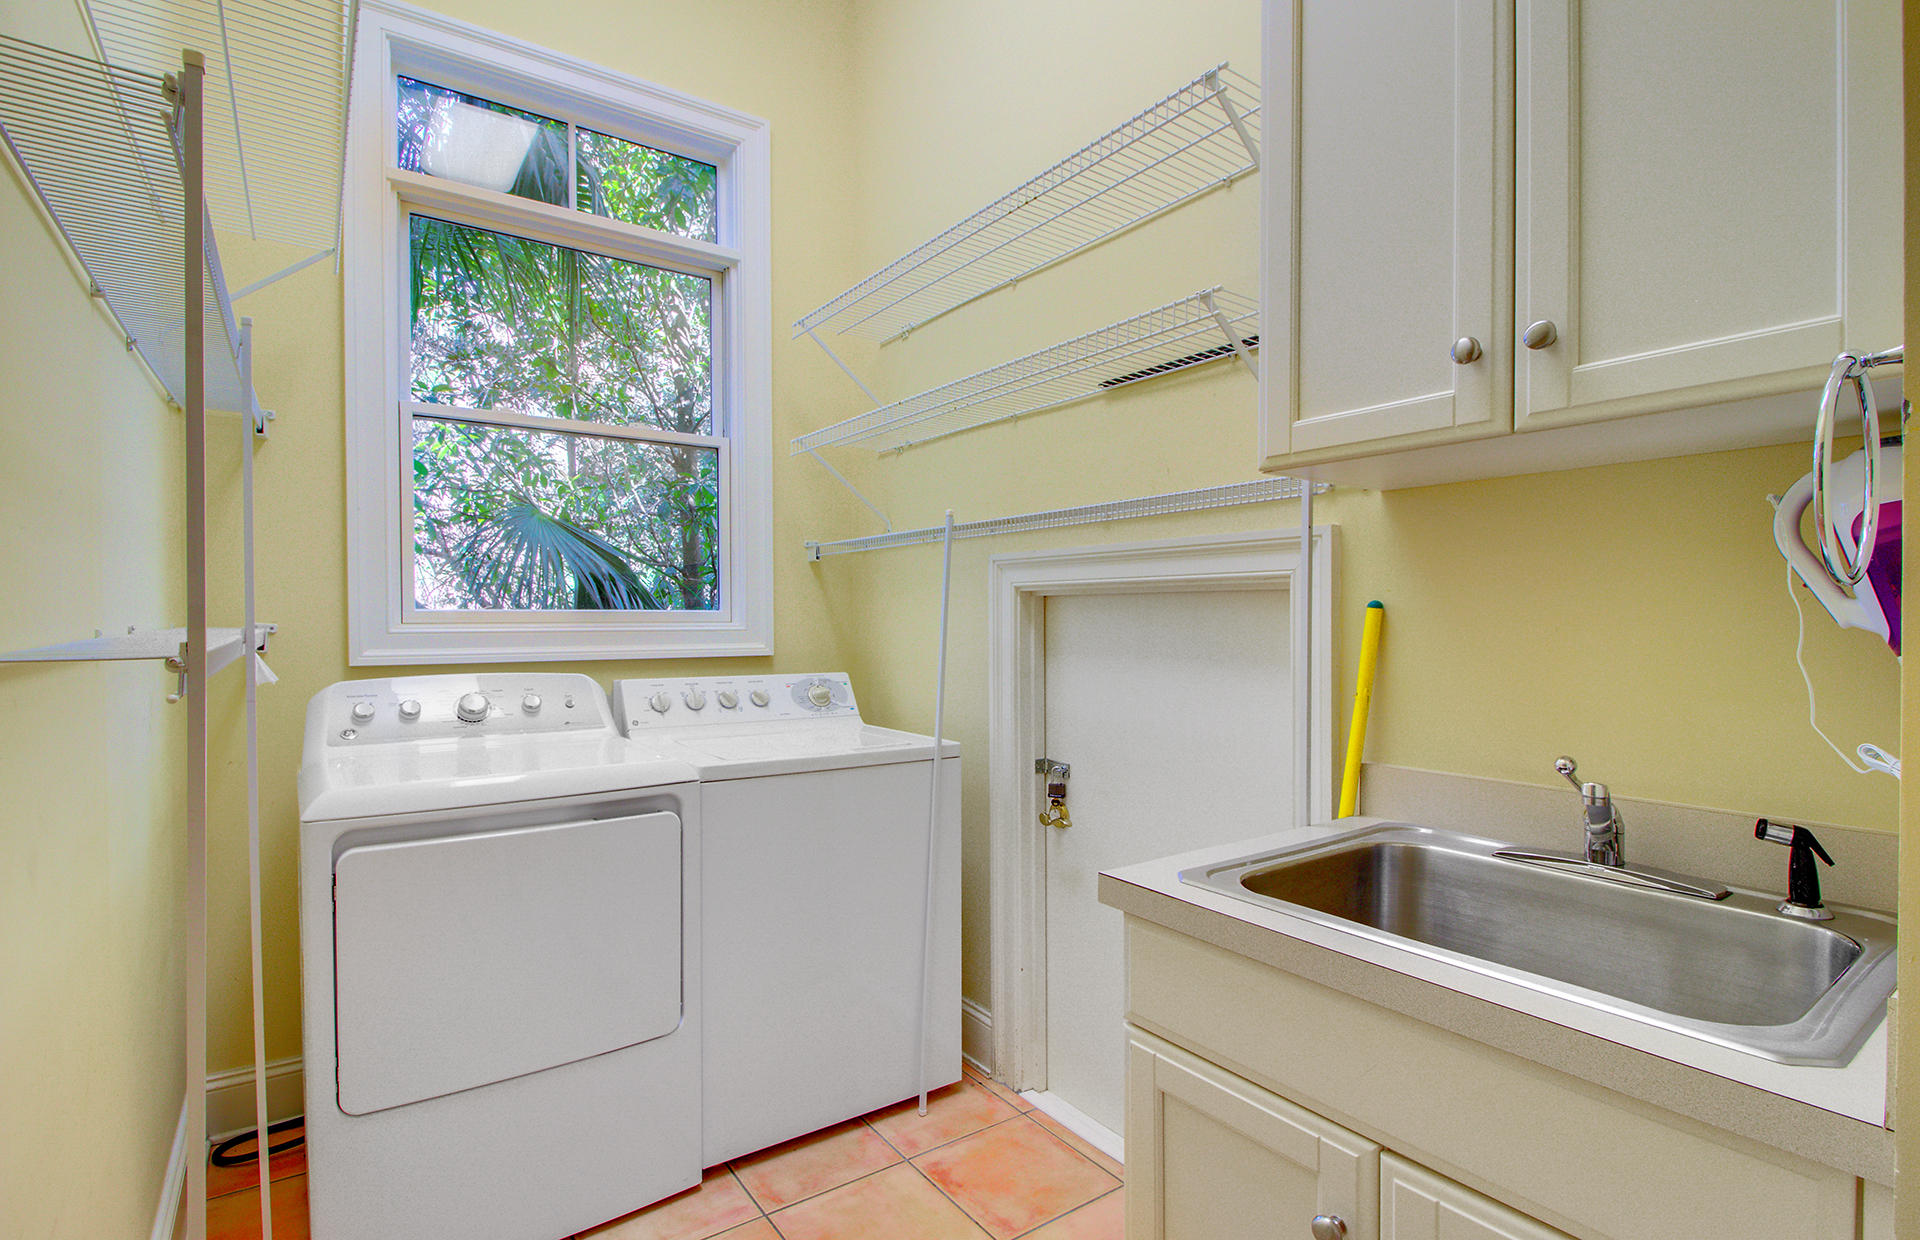 Kiawah Island Homes For Sale - 402 Ocean Oaks, Kiawah Island, SC - 39